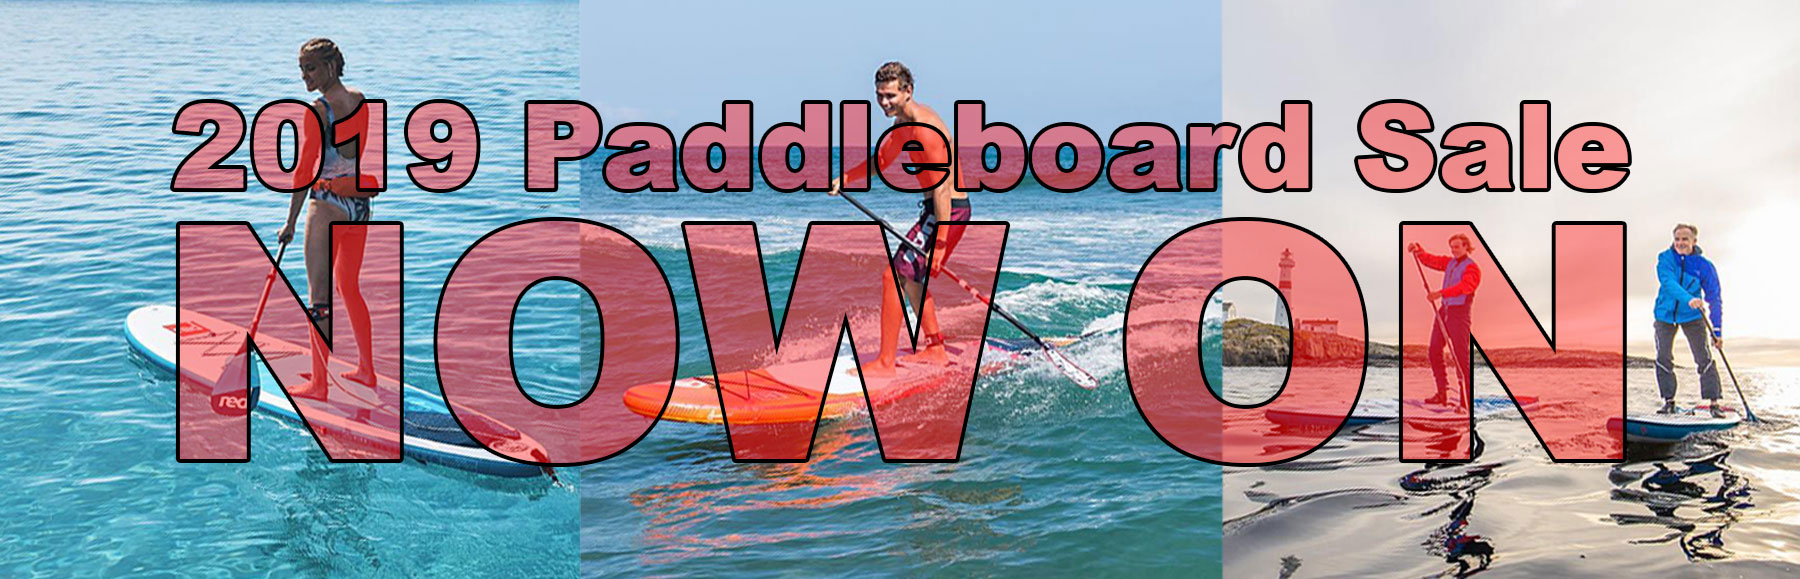 2019 Paddleboard Sale